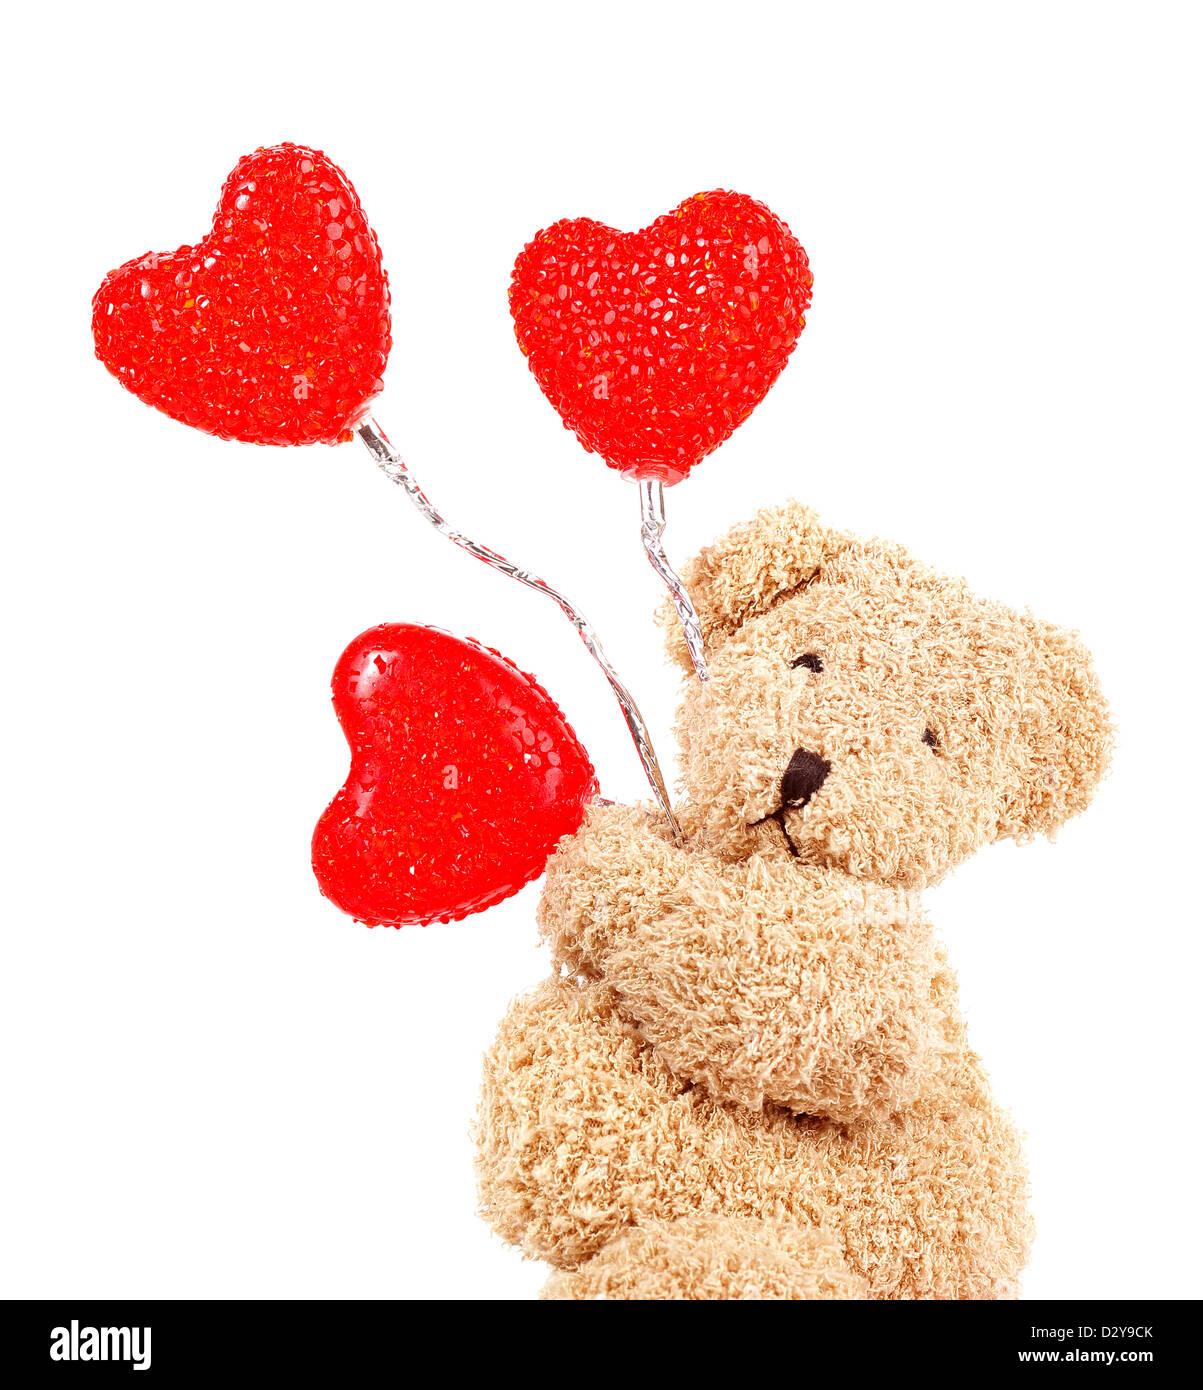 Teddy Heart Balloons Stockfotos & Teddy Heart Balloons Bilder - Alamy